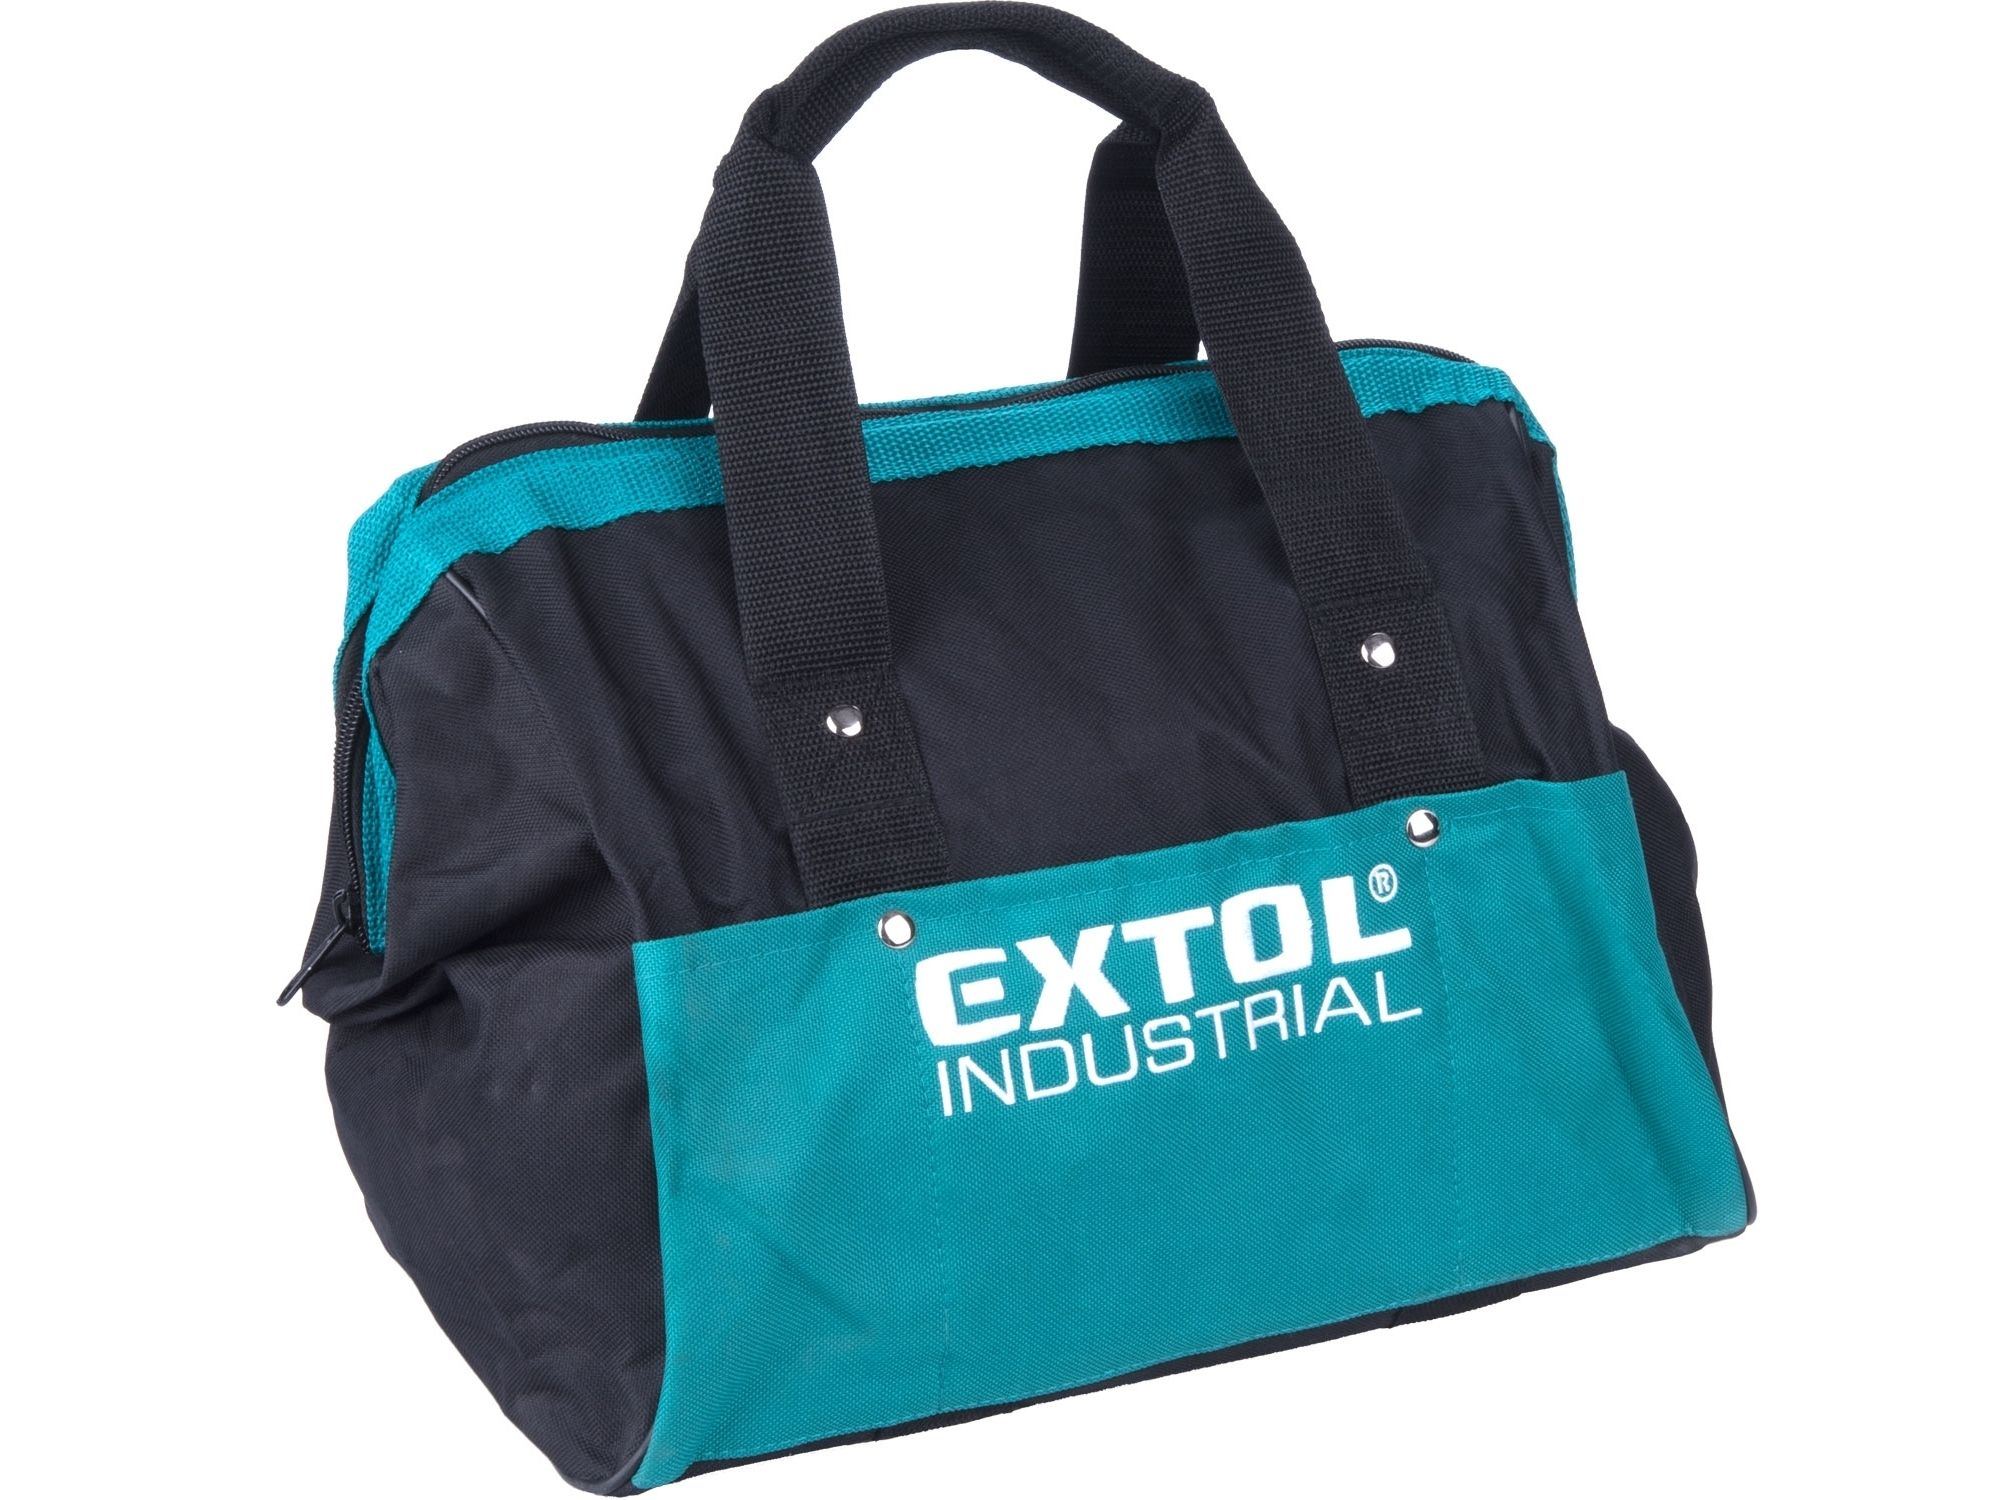 Taška na nářadí, 34x29x23cm EXTOL-INDUSTRIAL